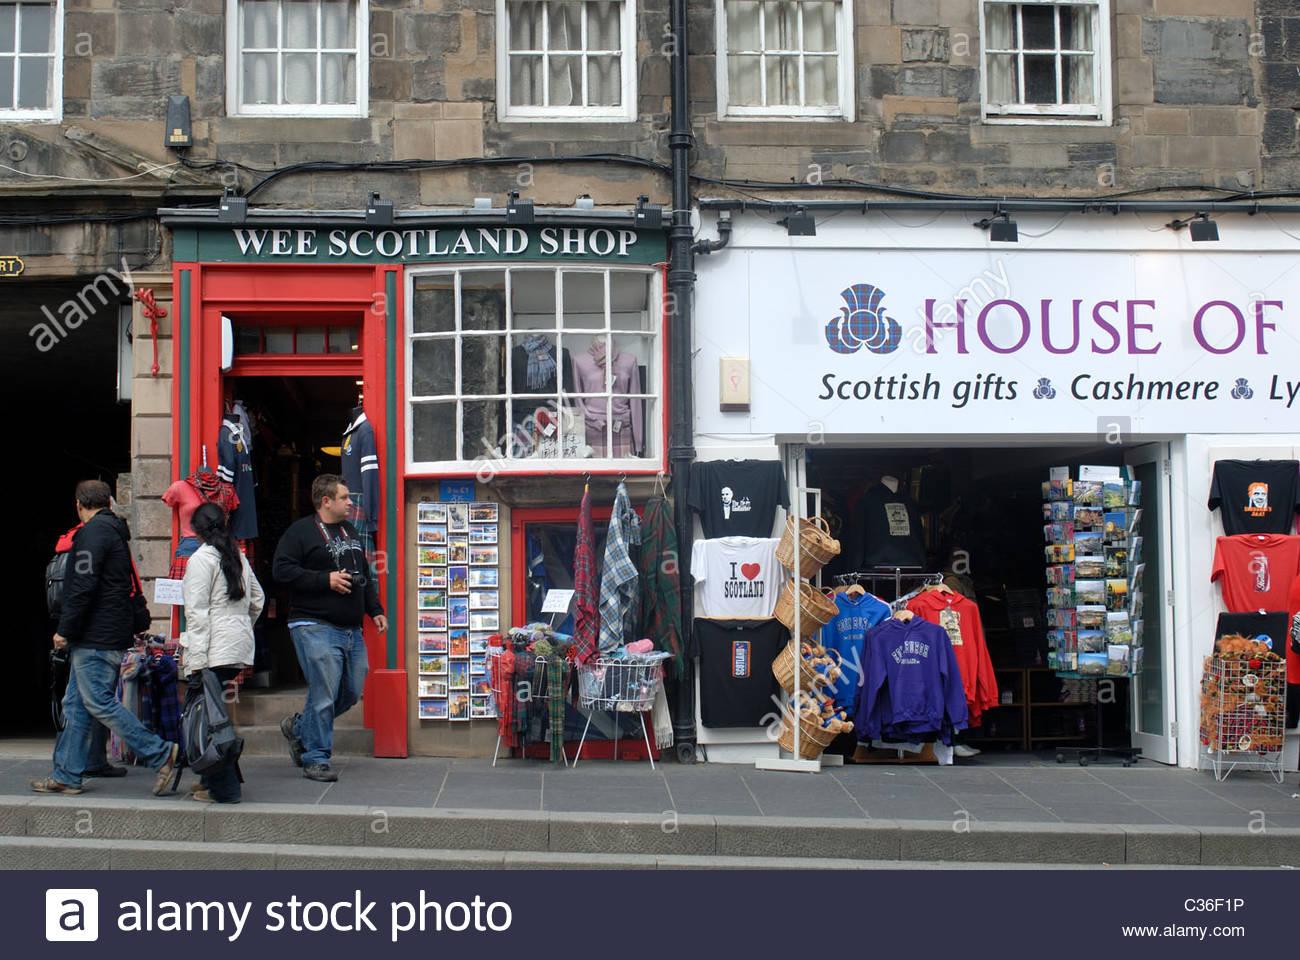 Scottish shops edinburgh royal mile webcam